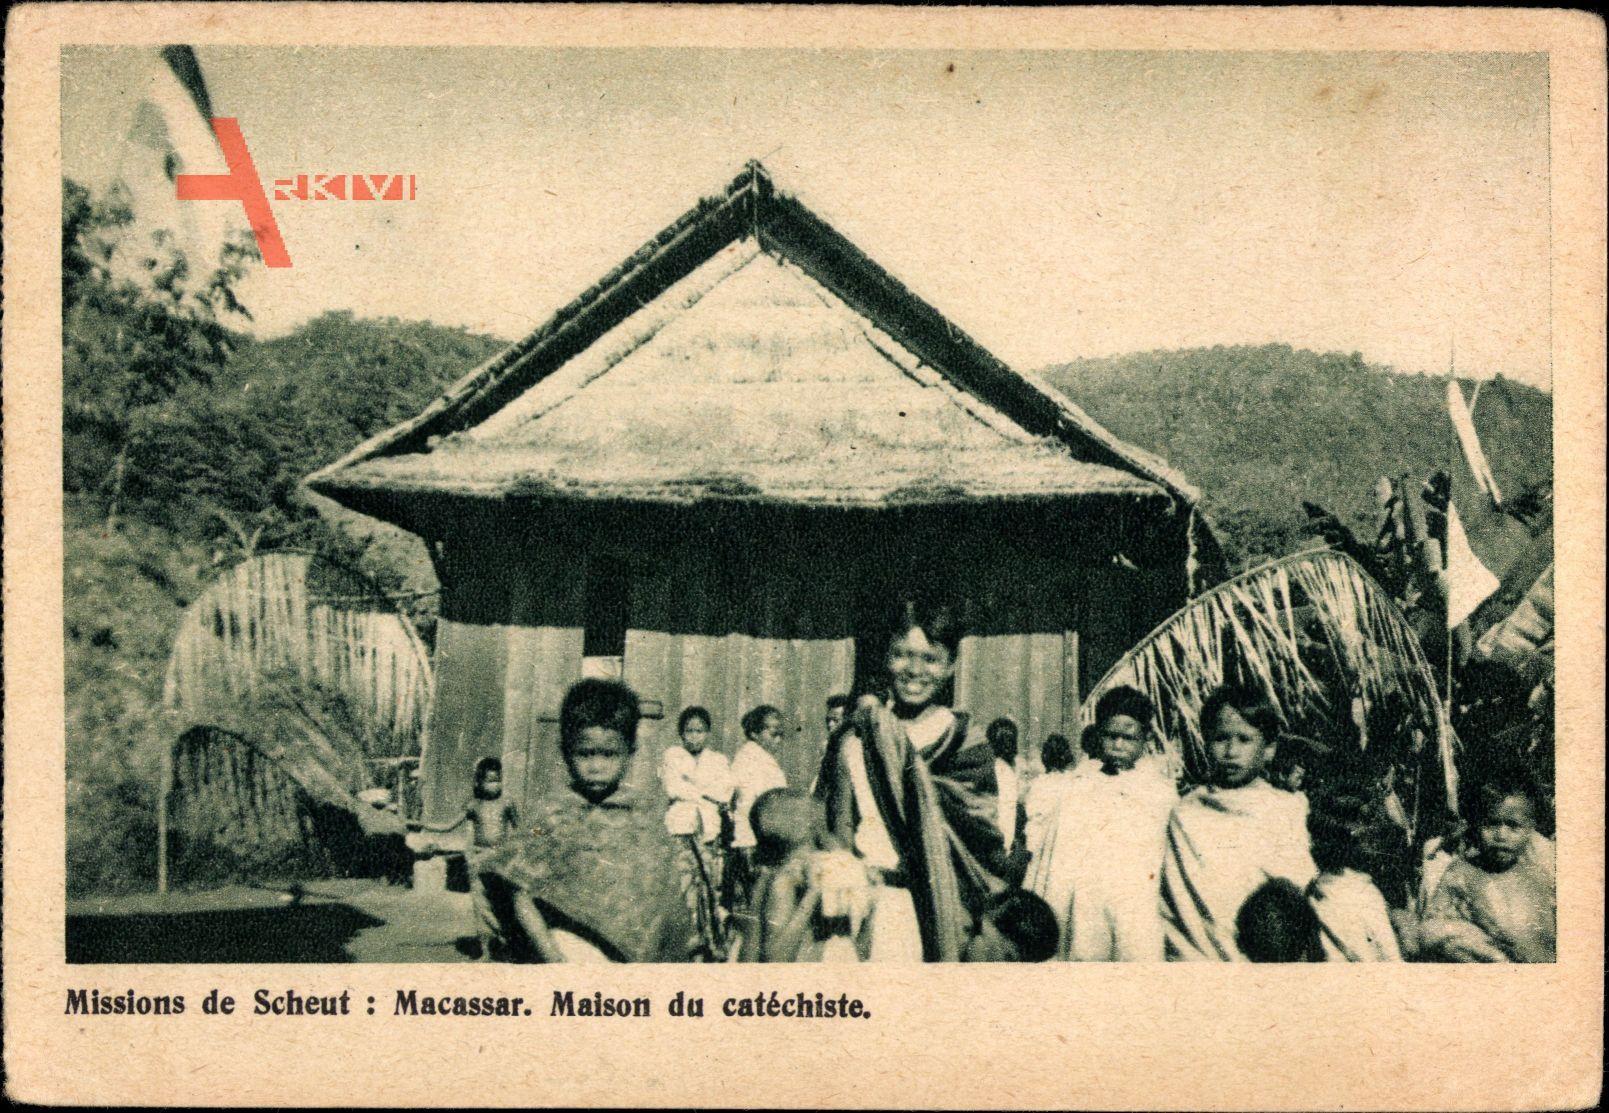 Macassar Südafrika, Missions de Scheut, Maison du Catéchiste, Missionierung